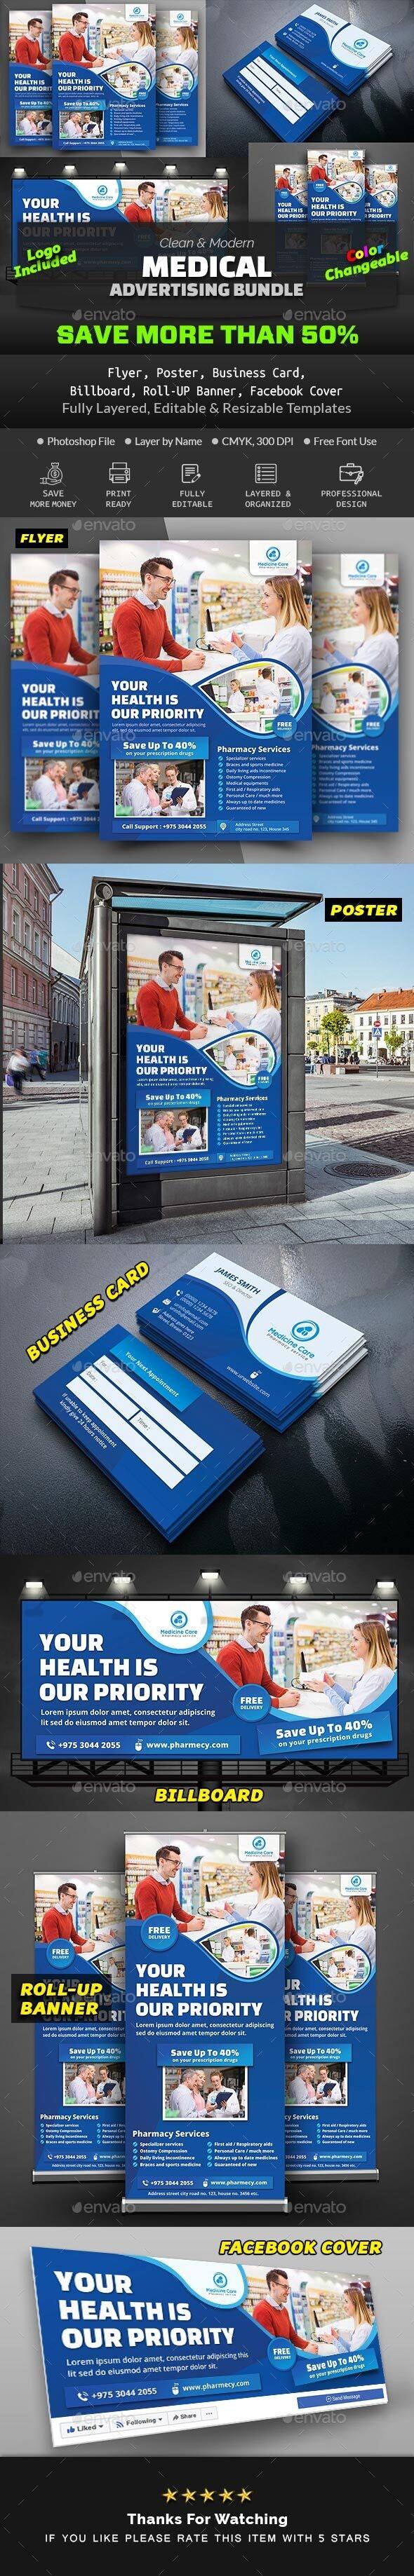 Pharmacy Advertising Bundle - Print Templates